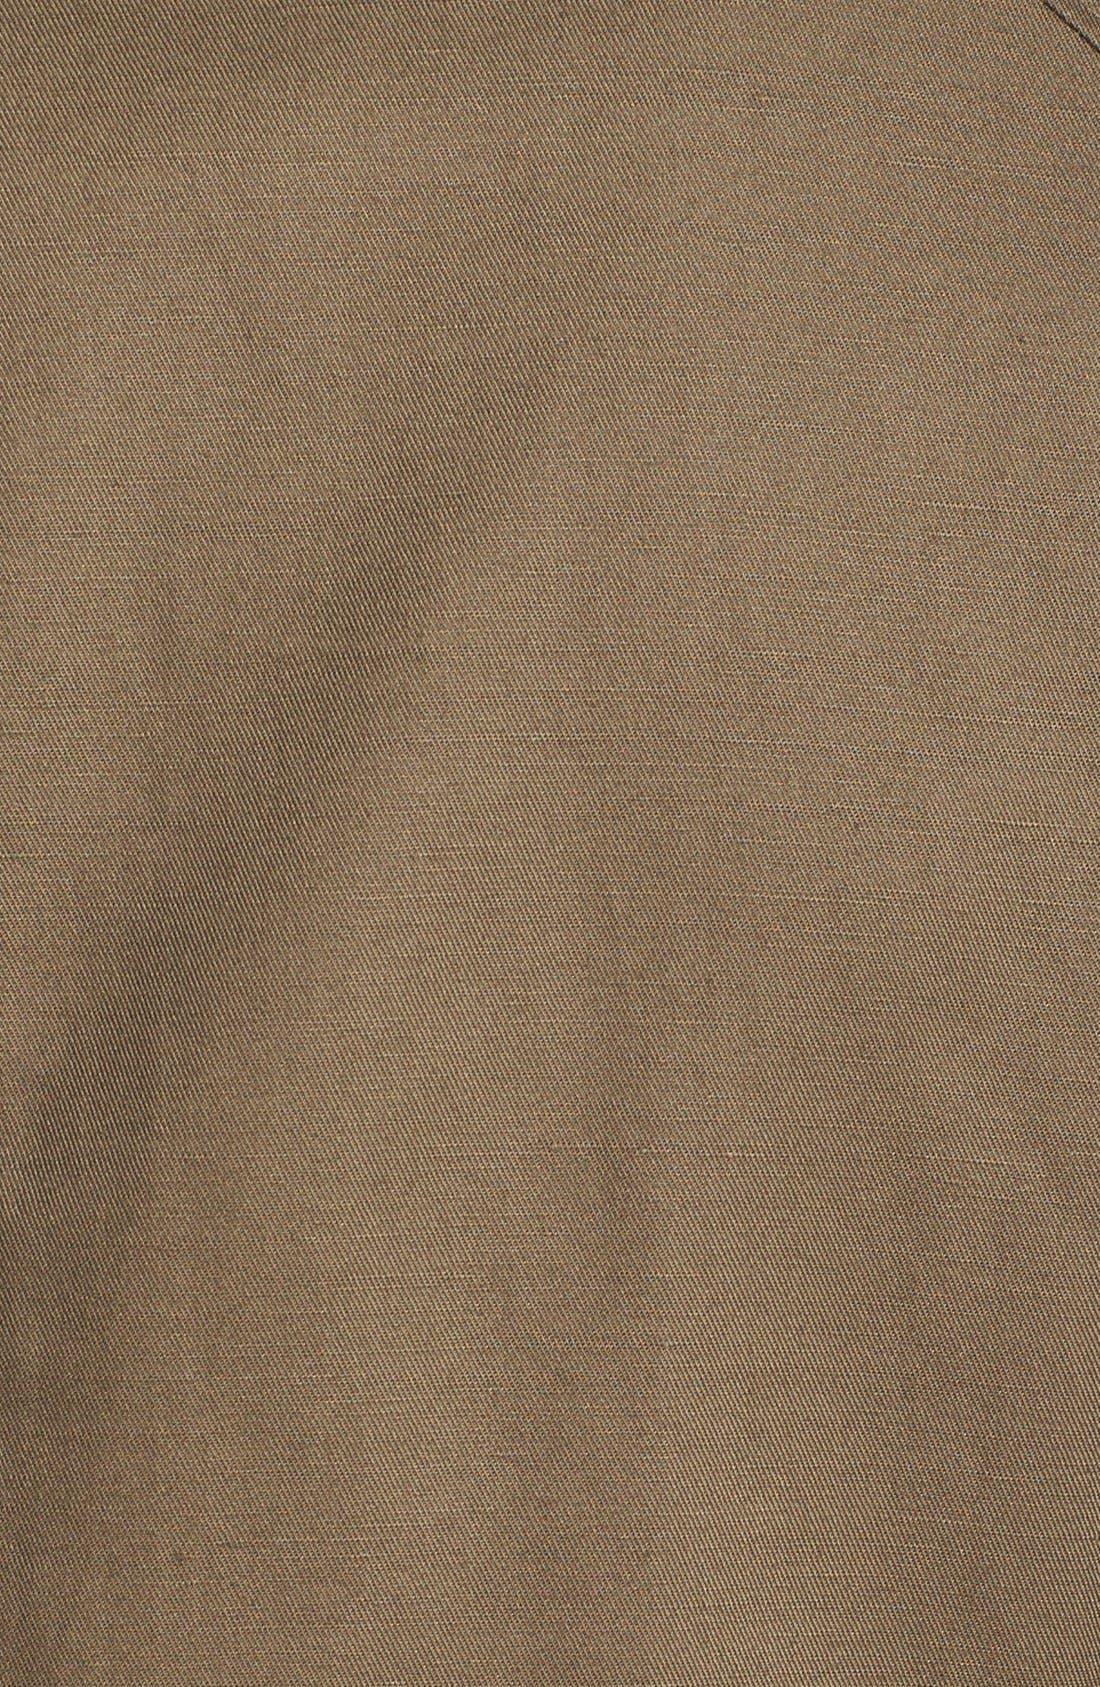 Alternate Image 3  - Vince Camuto Slim Fit Cotton & Linen Blazer